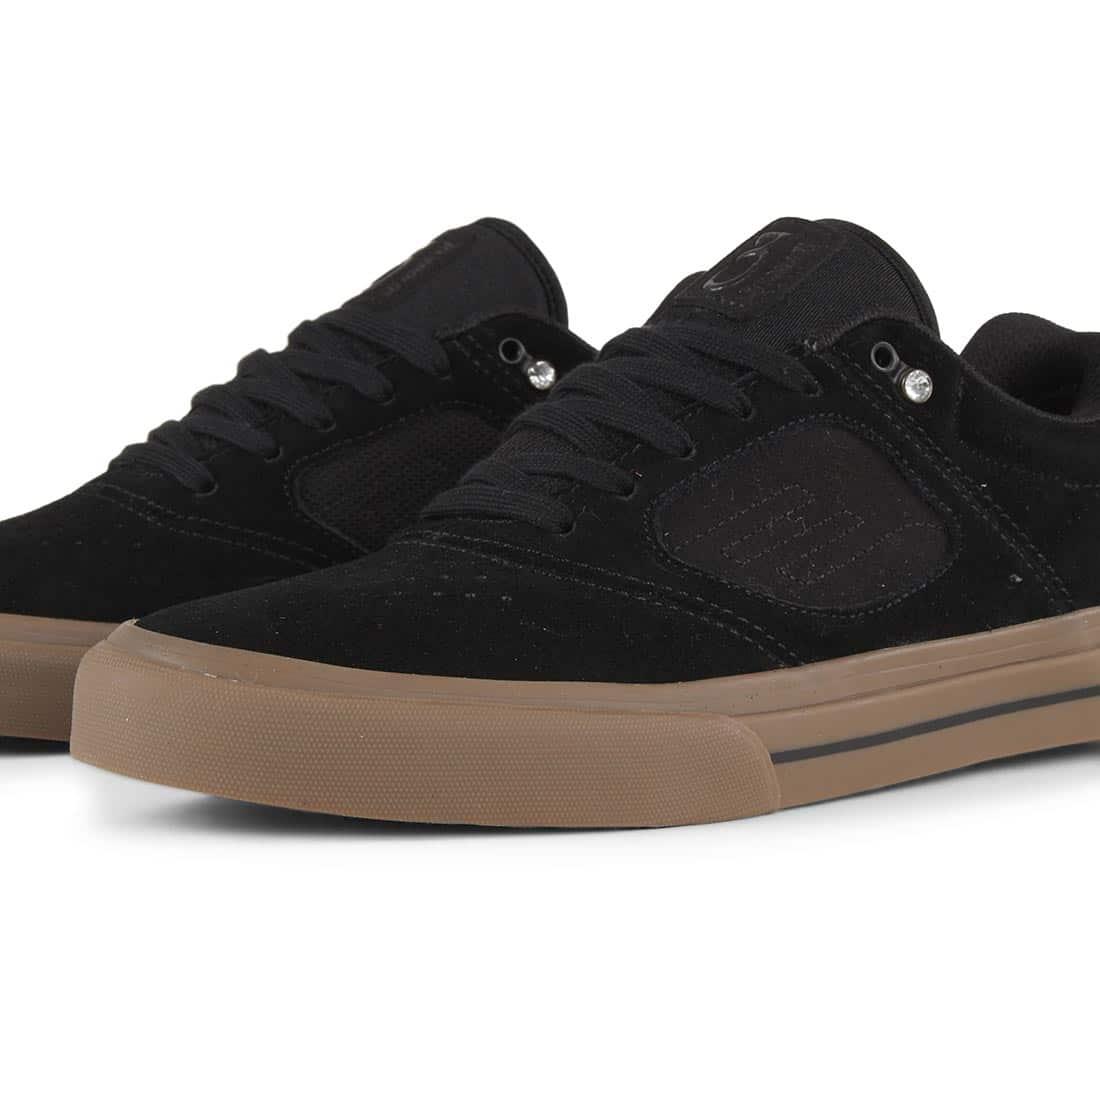 Emerica Reynolds 3 G6 Vulc Shoes - Black / Gum